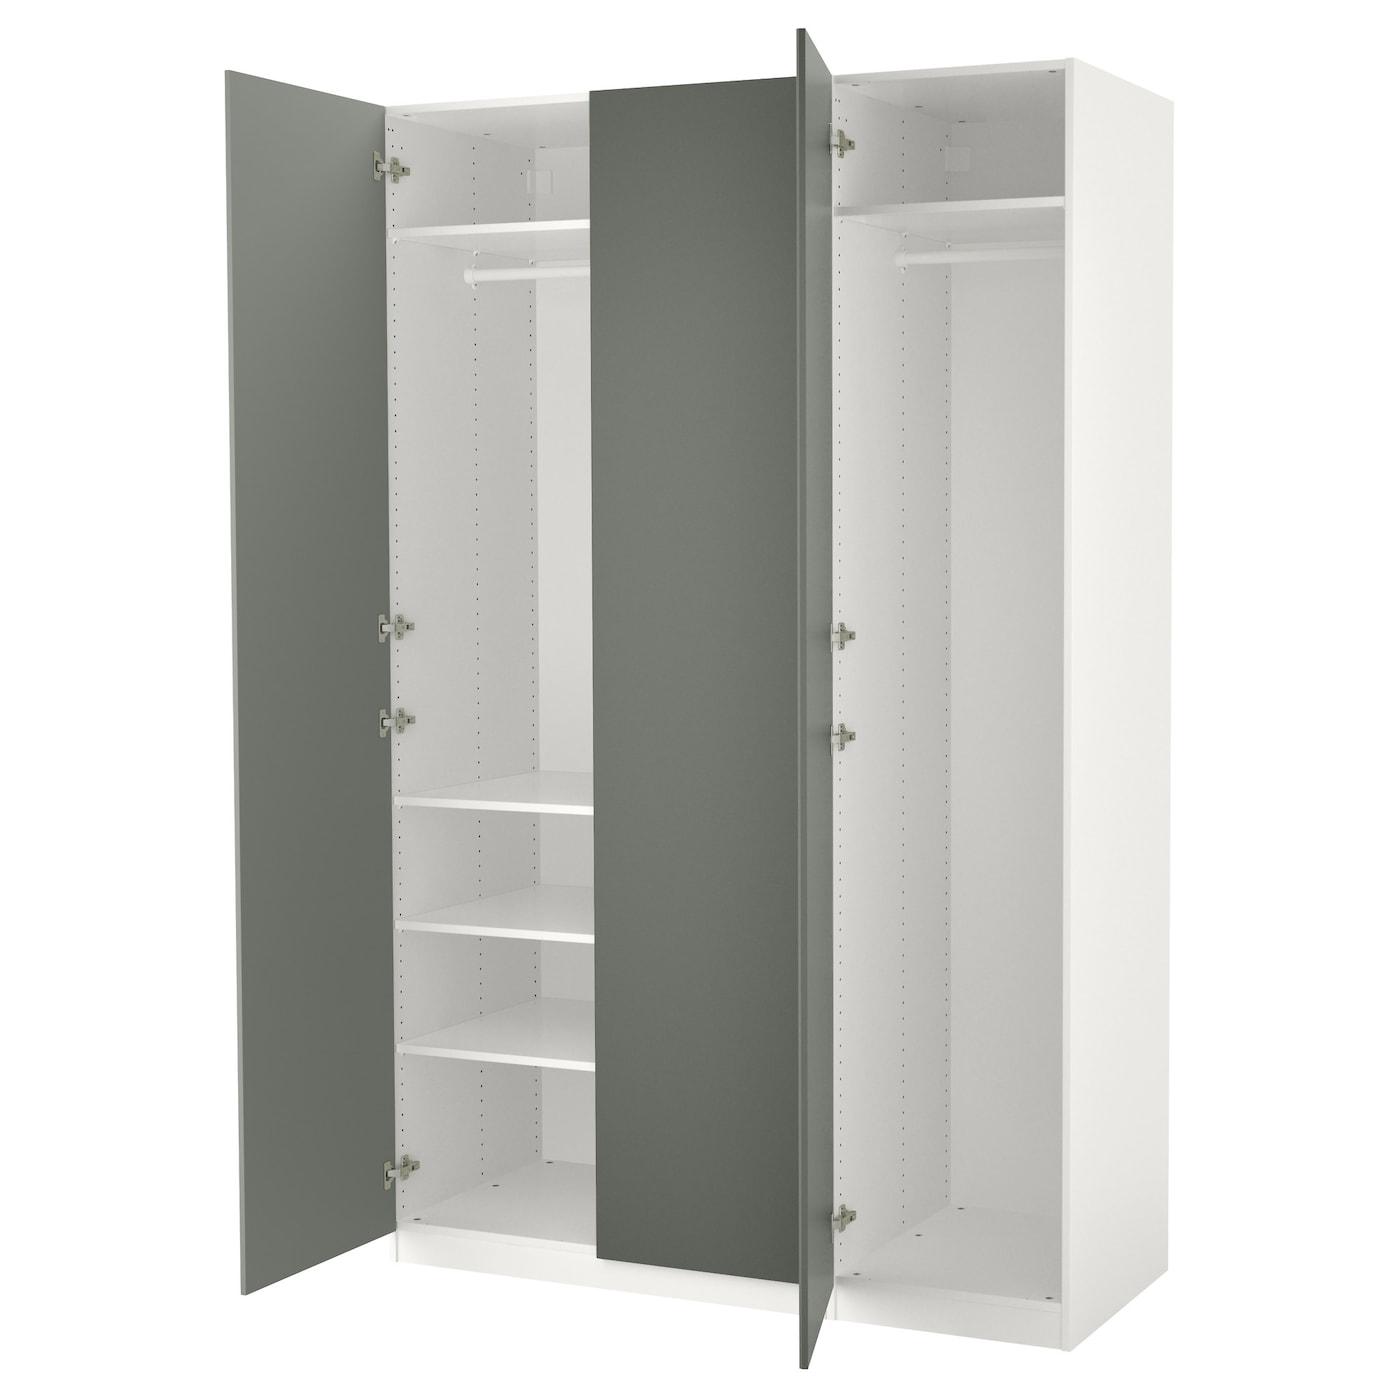 Pax armoire penderie blanc reinsvoll gris vert 150x60x236 cm ikea - Armoire ikea pax ...